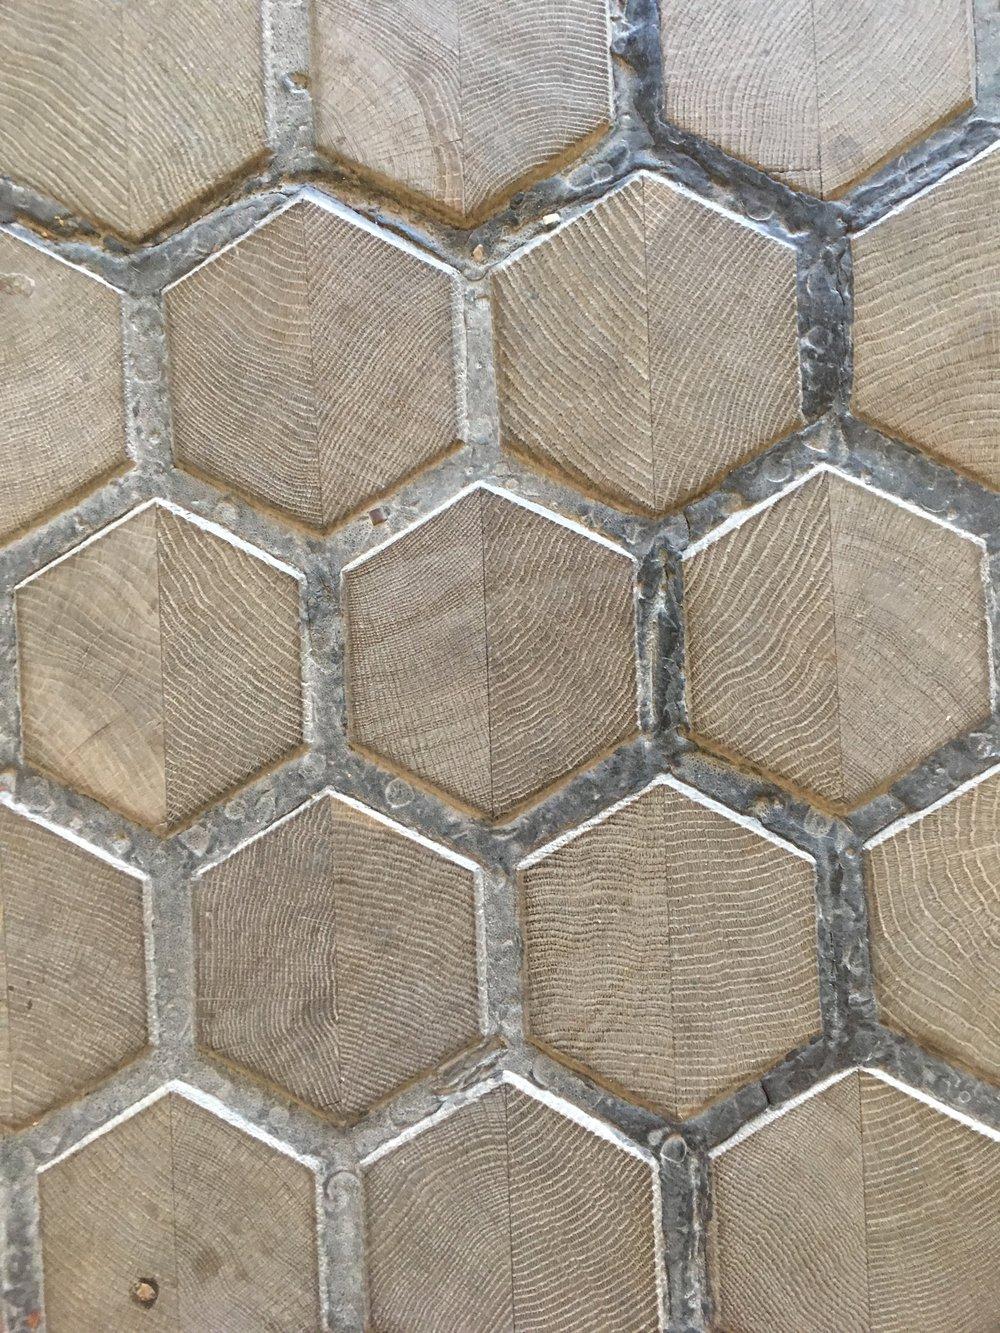 Interior Design Calgary, Home Decor & House Plans | Wood Hex Tile Schönbrunn Palace Vienna | Dutch Touch Interiors